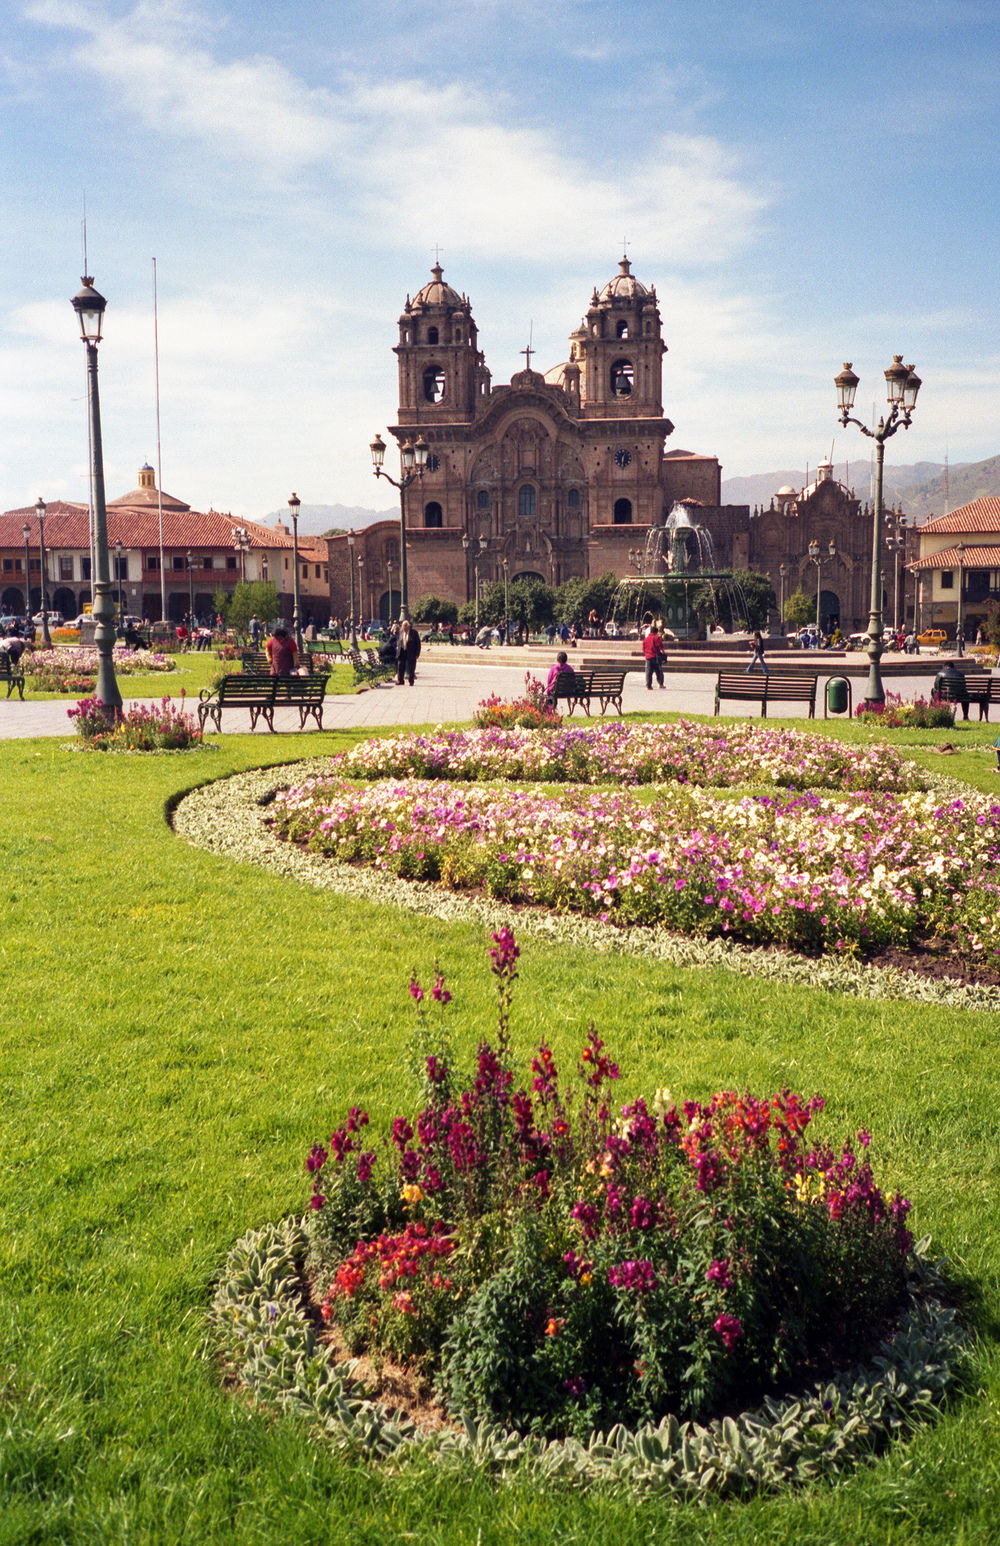 The Plaza in Cuzco